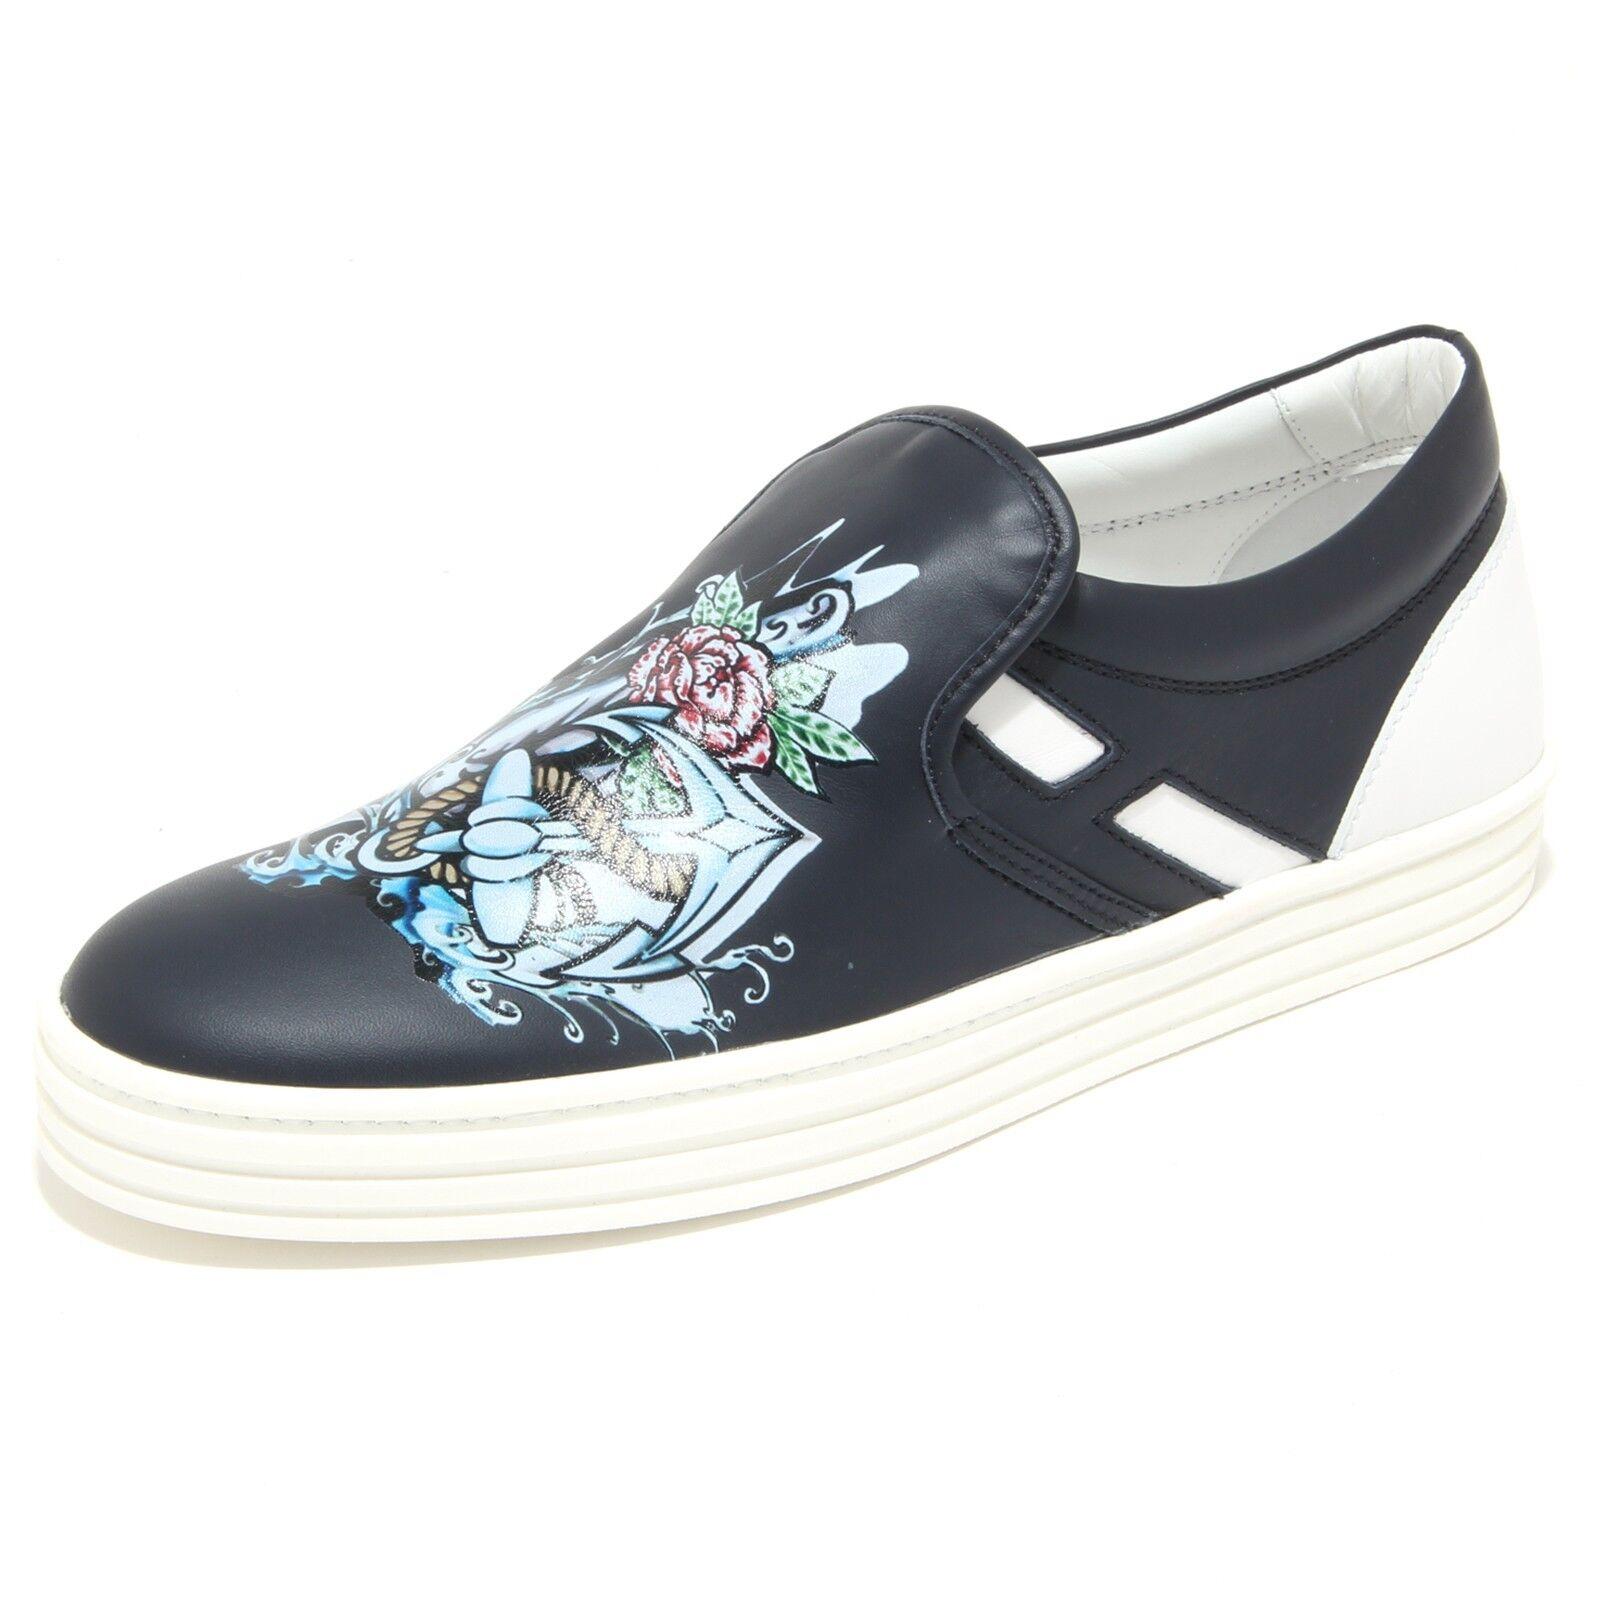 0390N slip on HOGAN REBEL scarpe blu uomo sneaker shoes men blu scarpe 448764